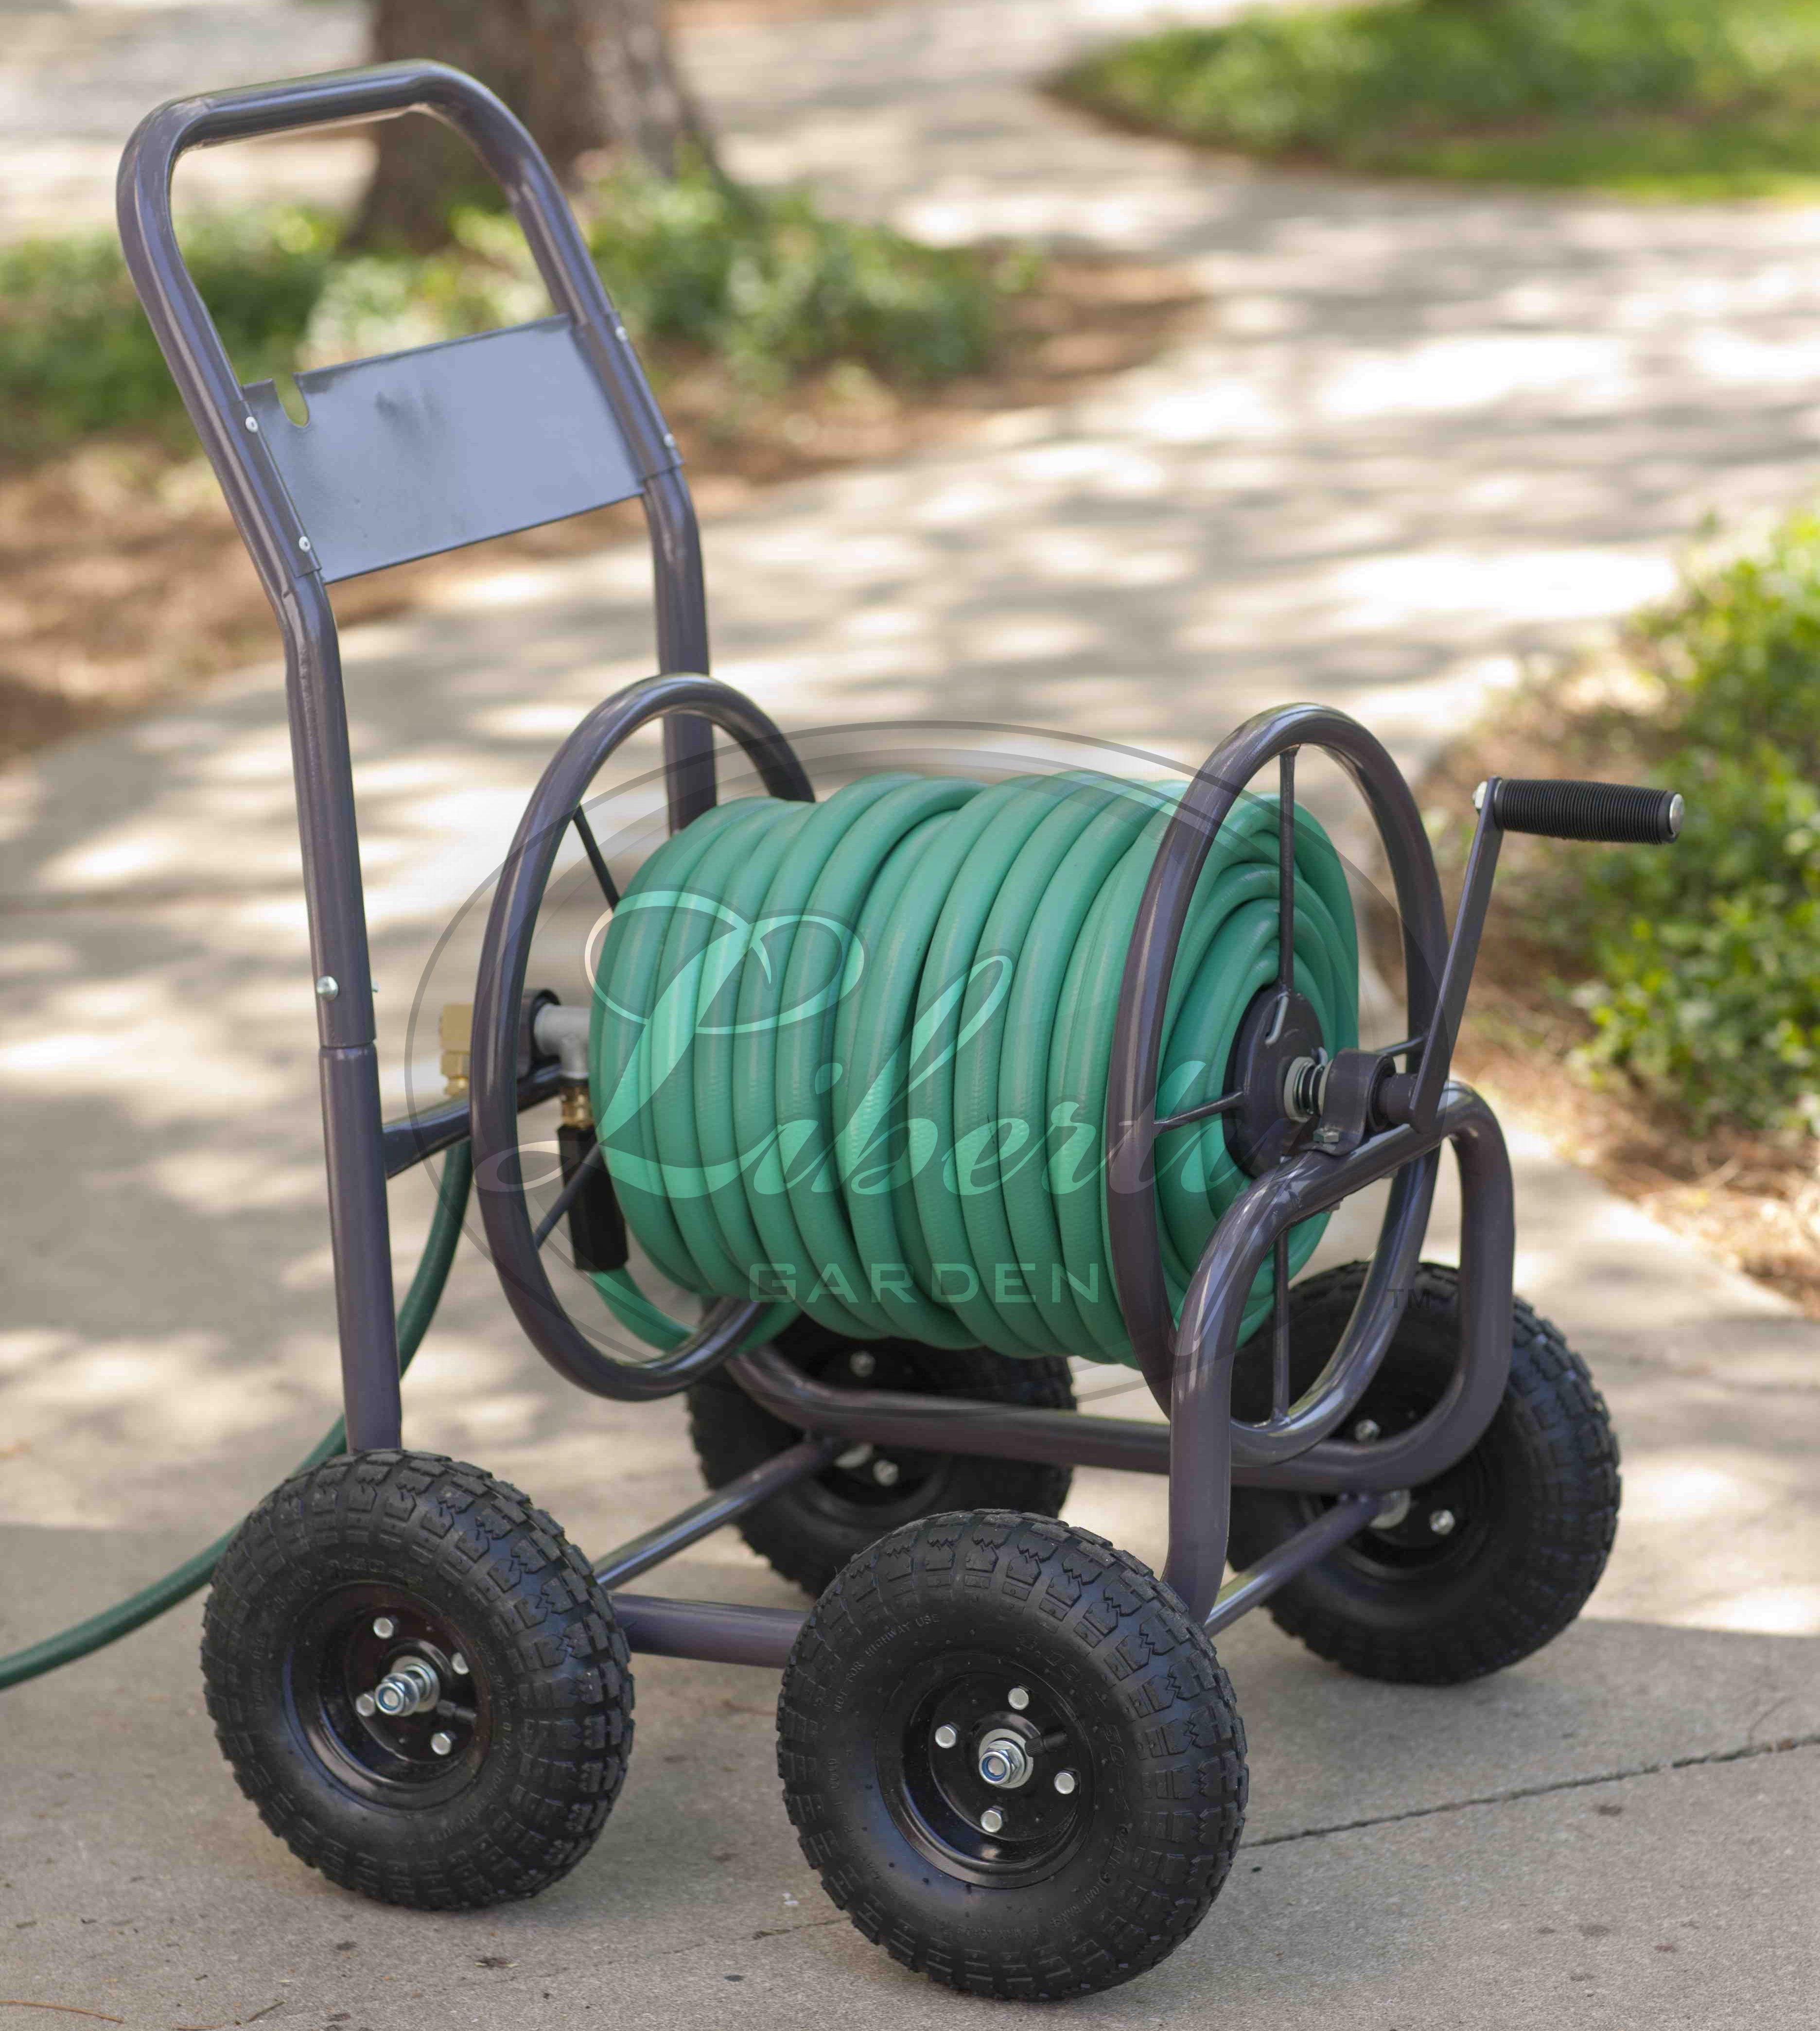 The versatile 871 Four Wheel Hose Cart features a